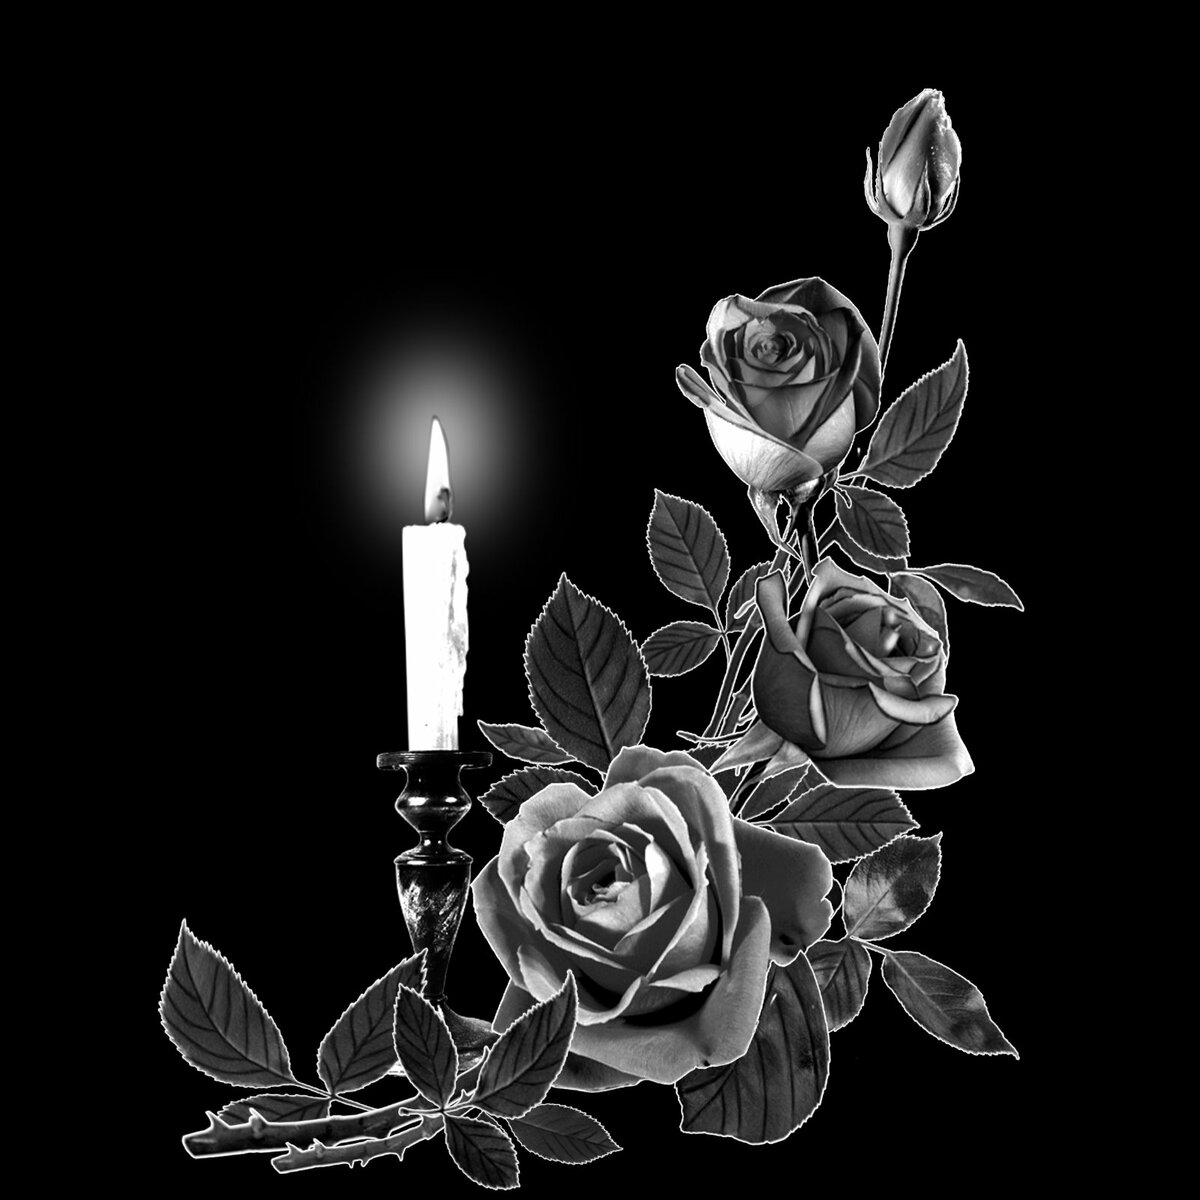 добавлю цветы и свеча на памятник фото обязательно